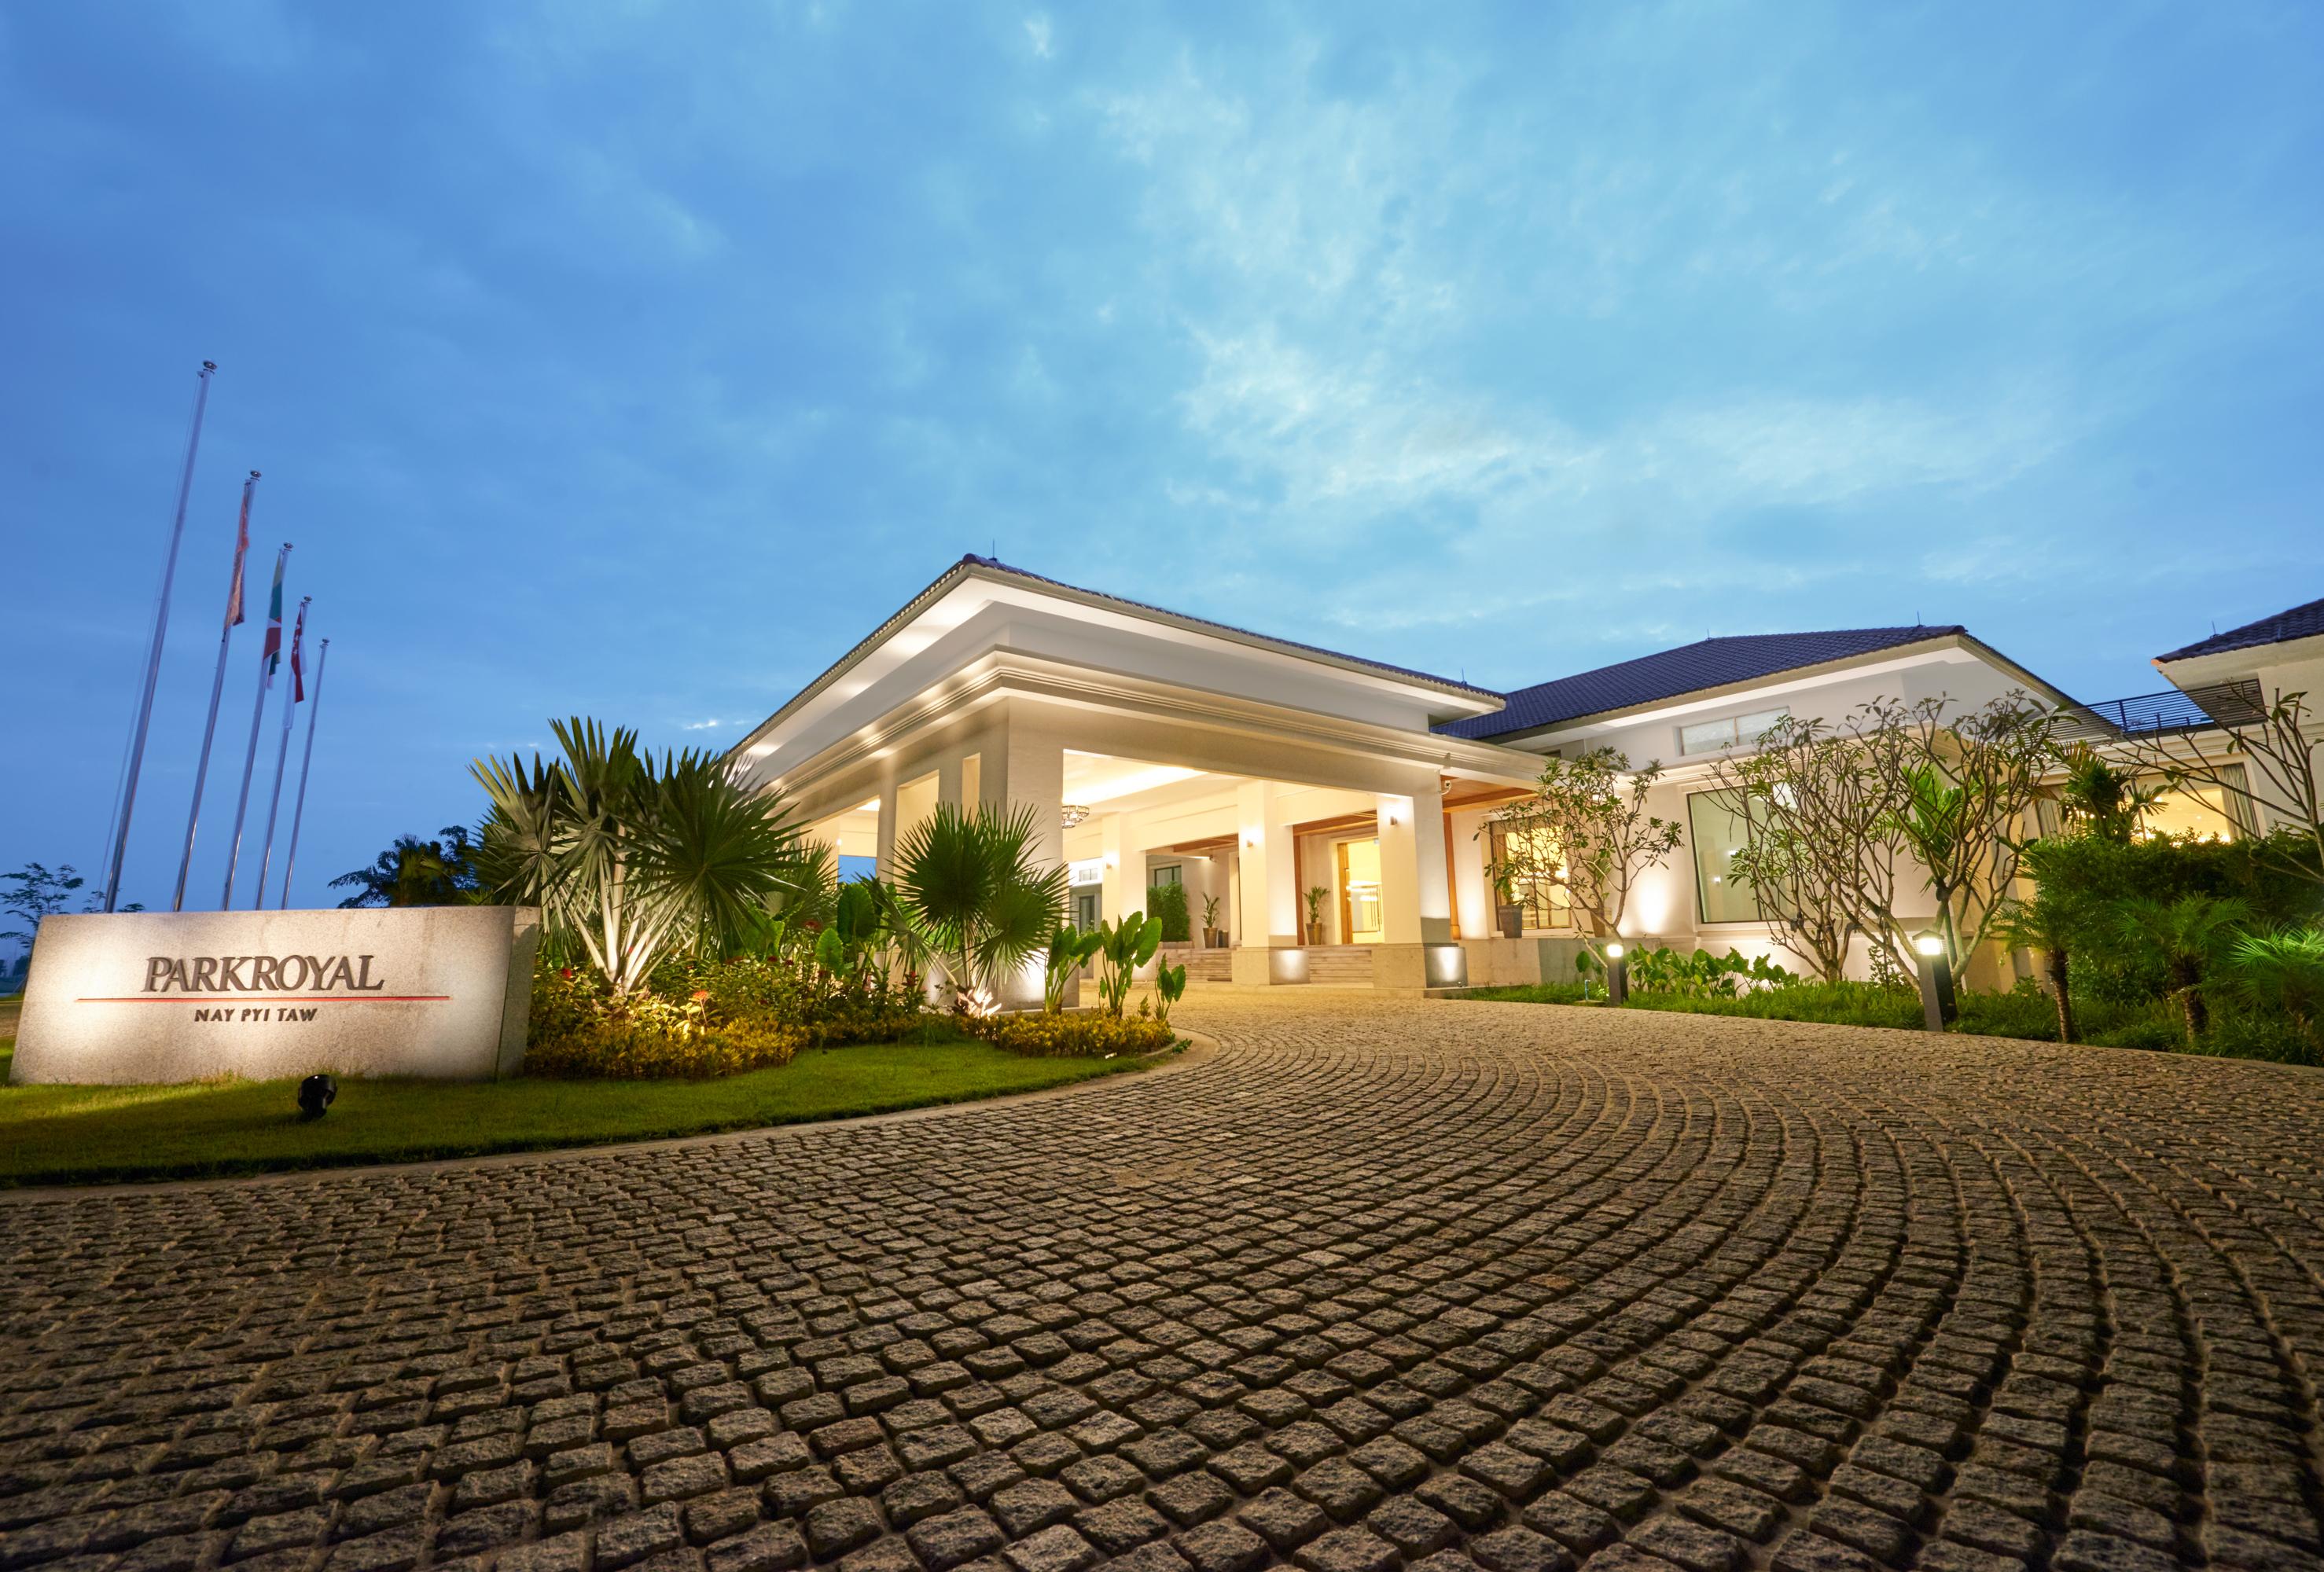 Parkroyal Nay Pyi Taw Hotel, Naypyitaw